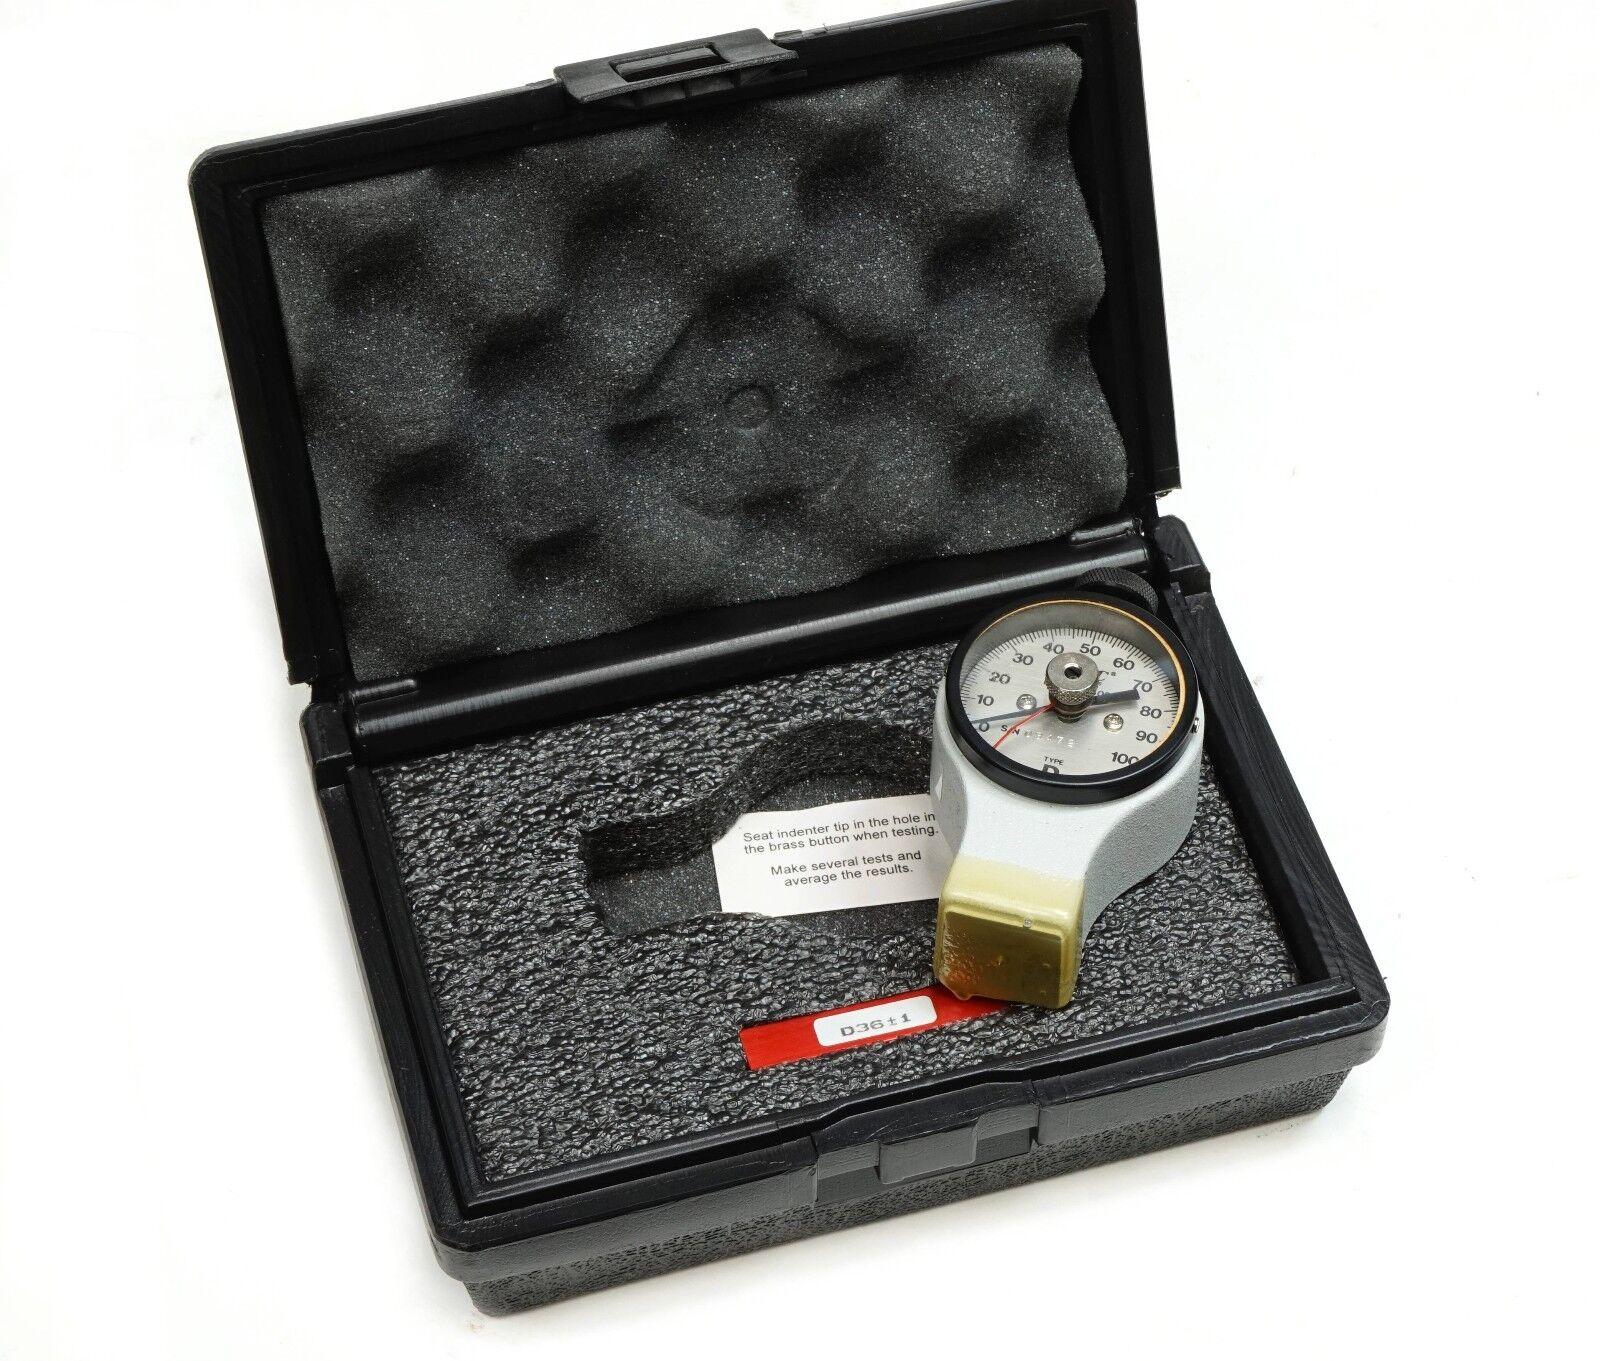 PTC Durometer